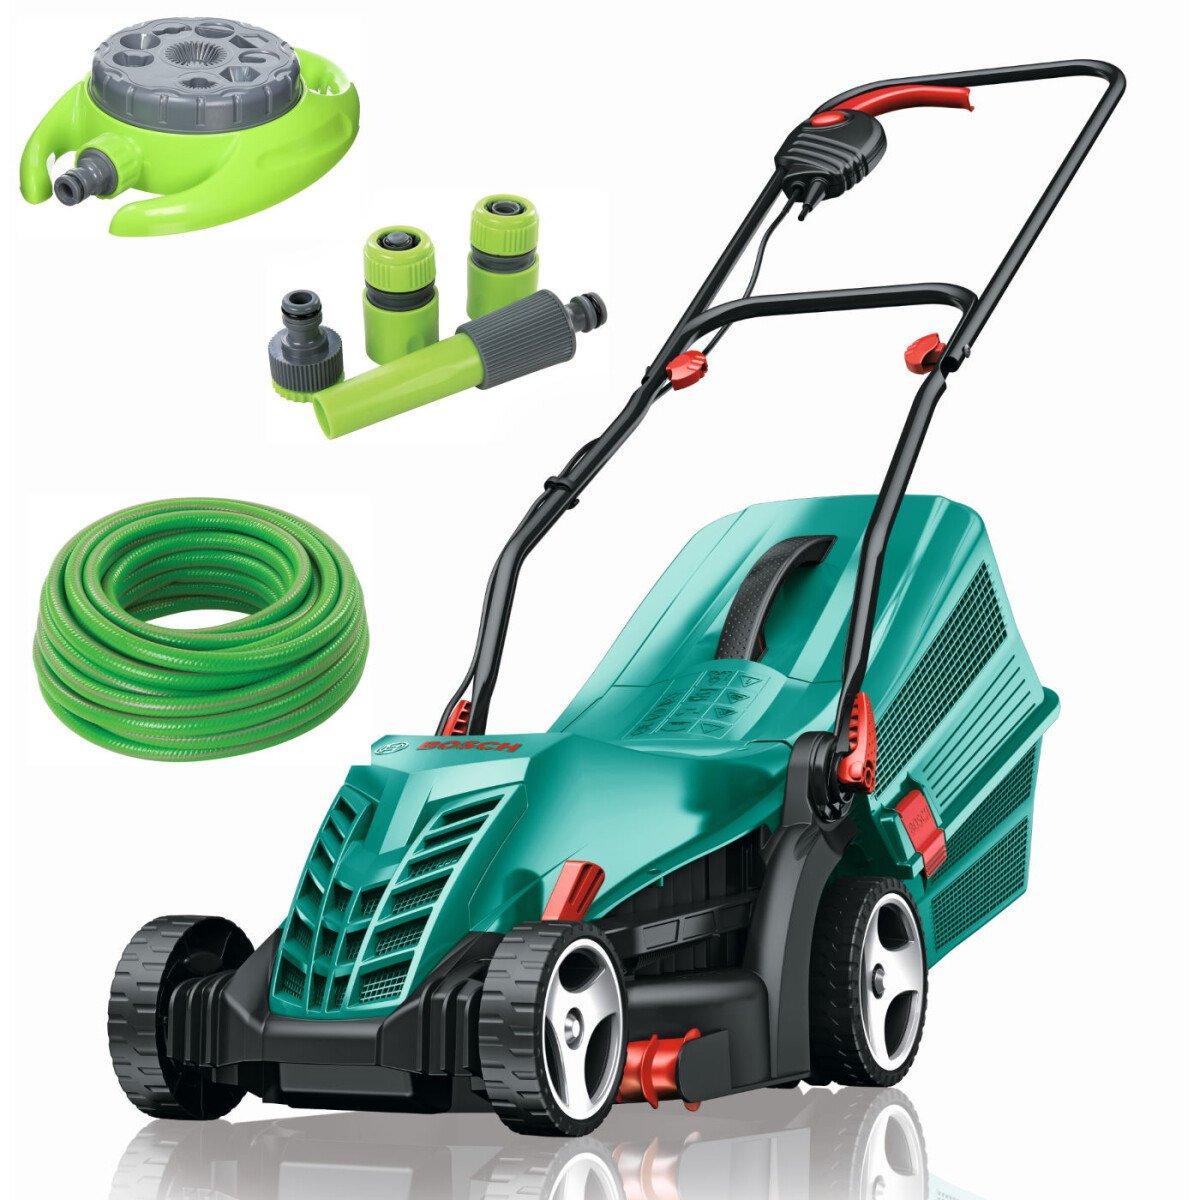 Bosch Rotak 34 R Kit 1300W 34cm Lawnmower with 15m Hose, 9 Pattern Sprinkler & 4pc Hose Connector